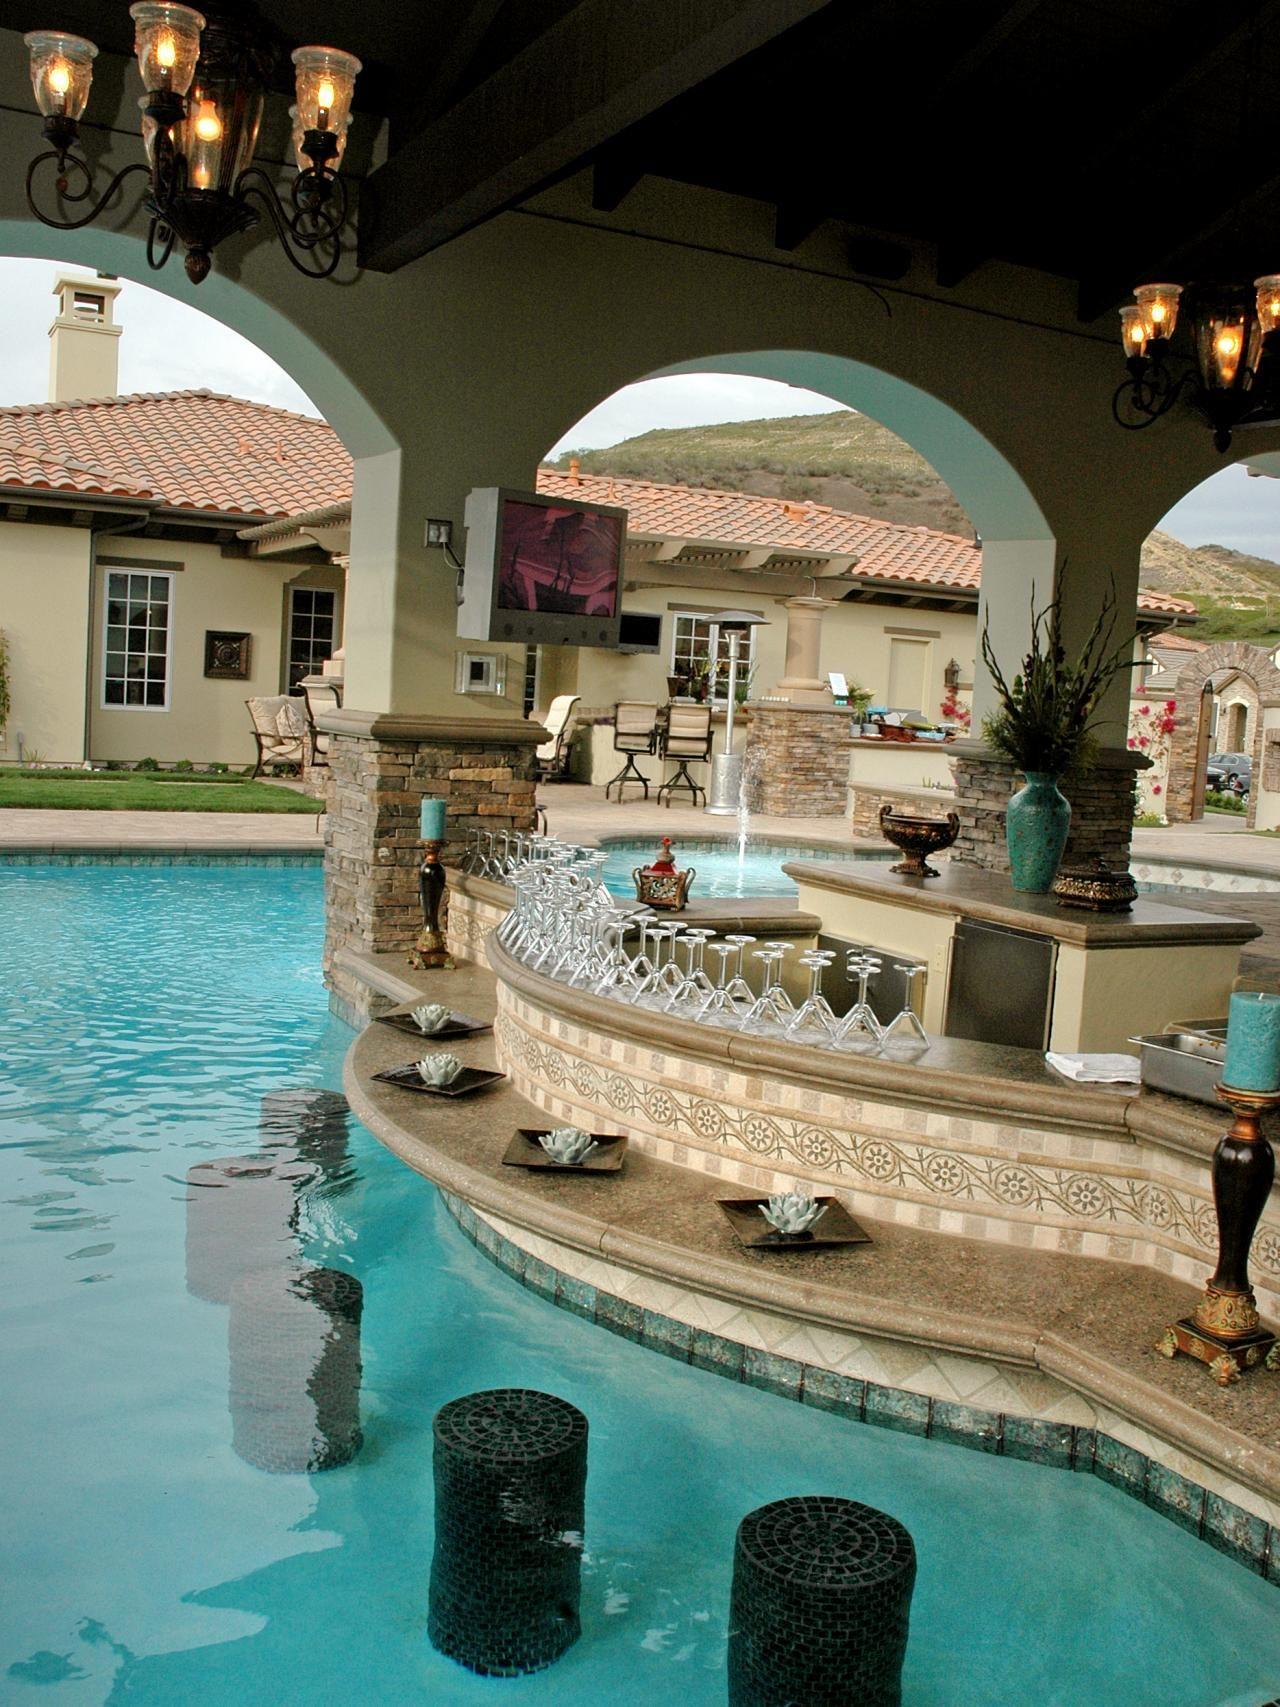 Outdoor Bar Ideas Diy Or Buy An Outdoor Bar Pool Houses Backyard Pool Backyard Pool Designs Diy backyard swim up bar